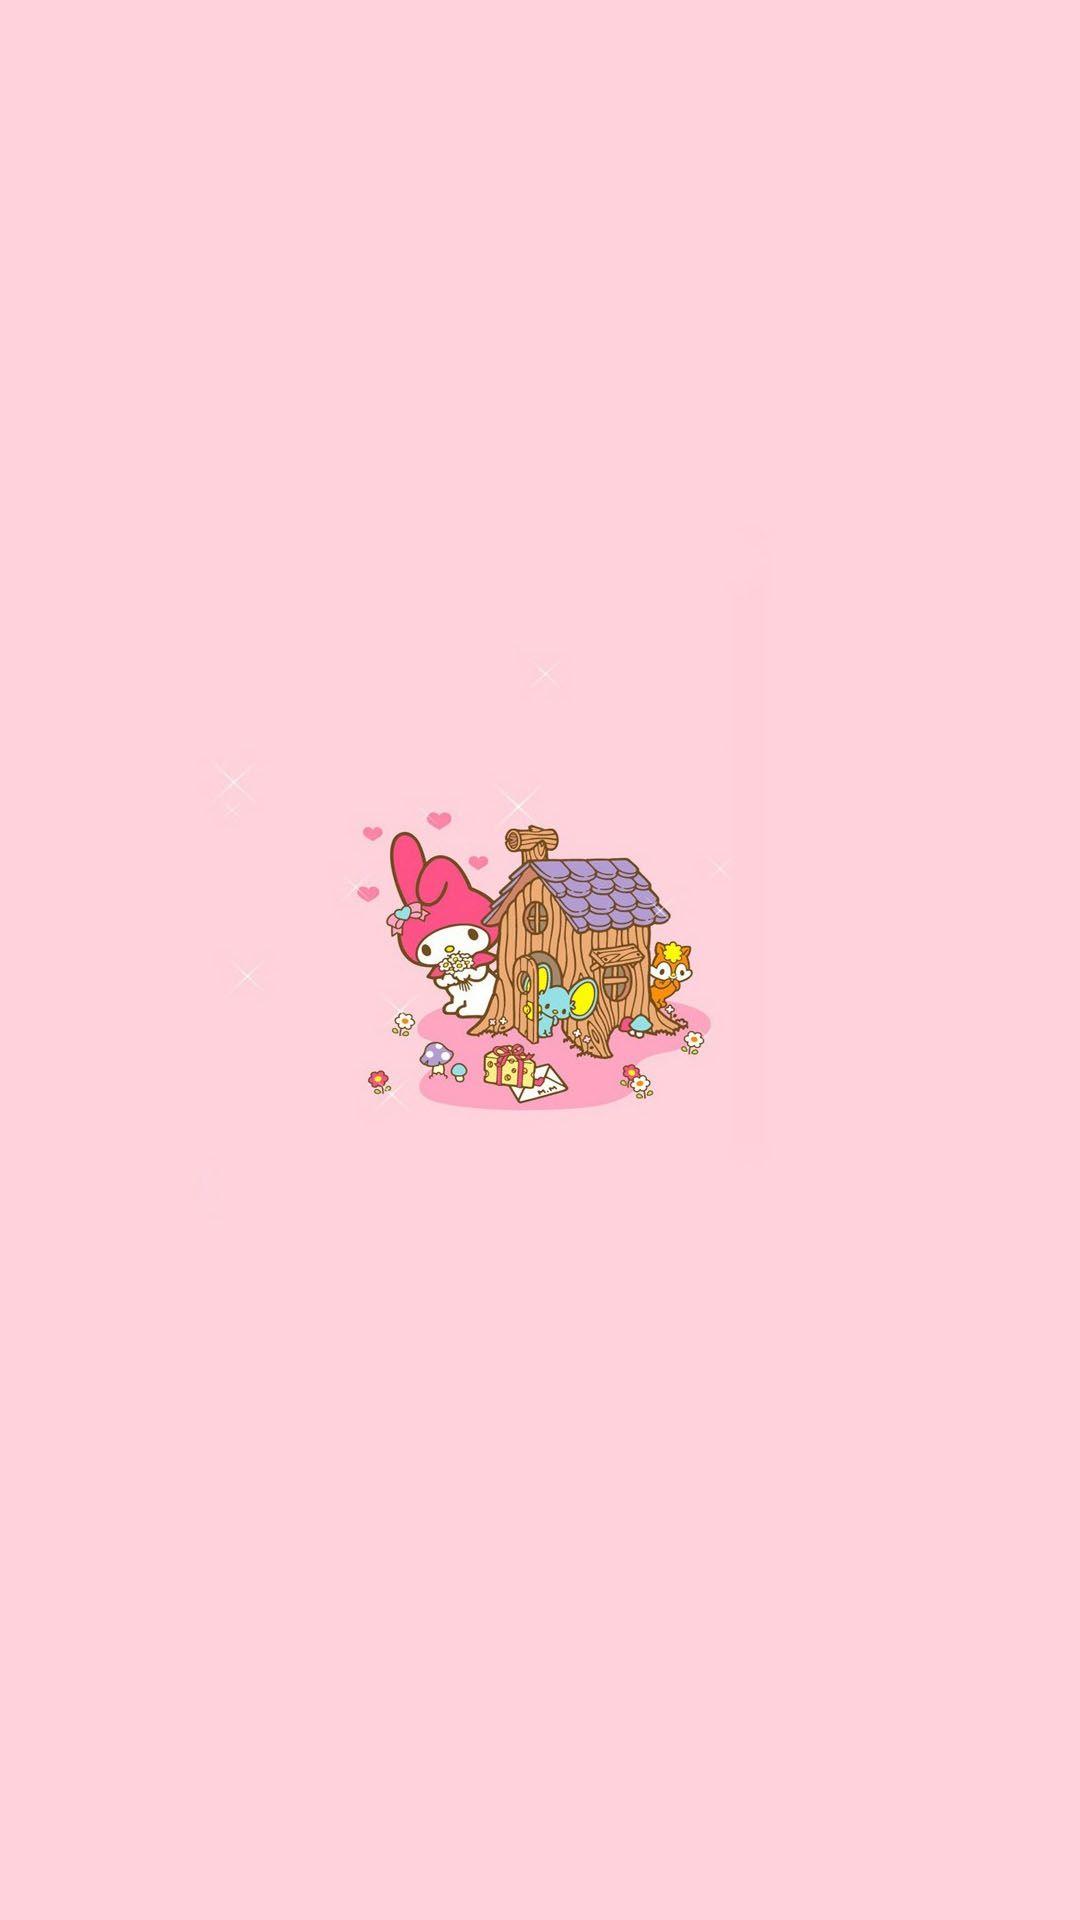 Pink Cartoon Character Character Wallpaper Cartoon Wallpaper Personalized Wallpaper